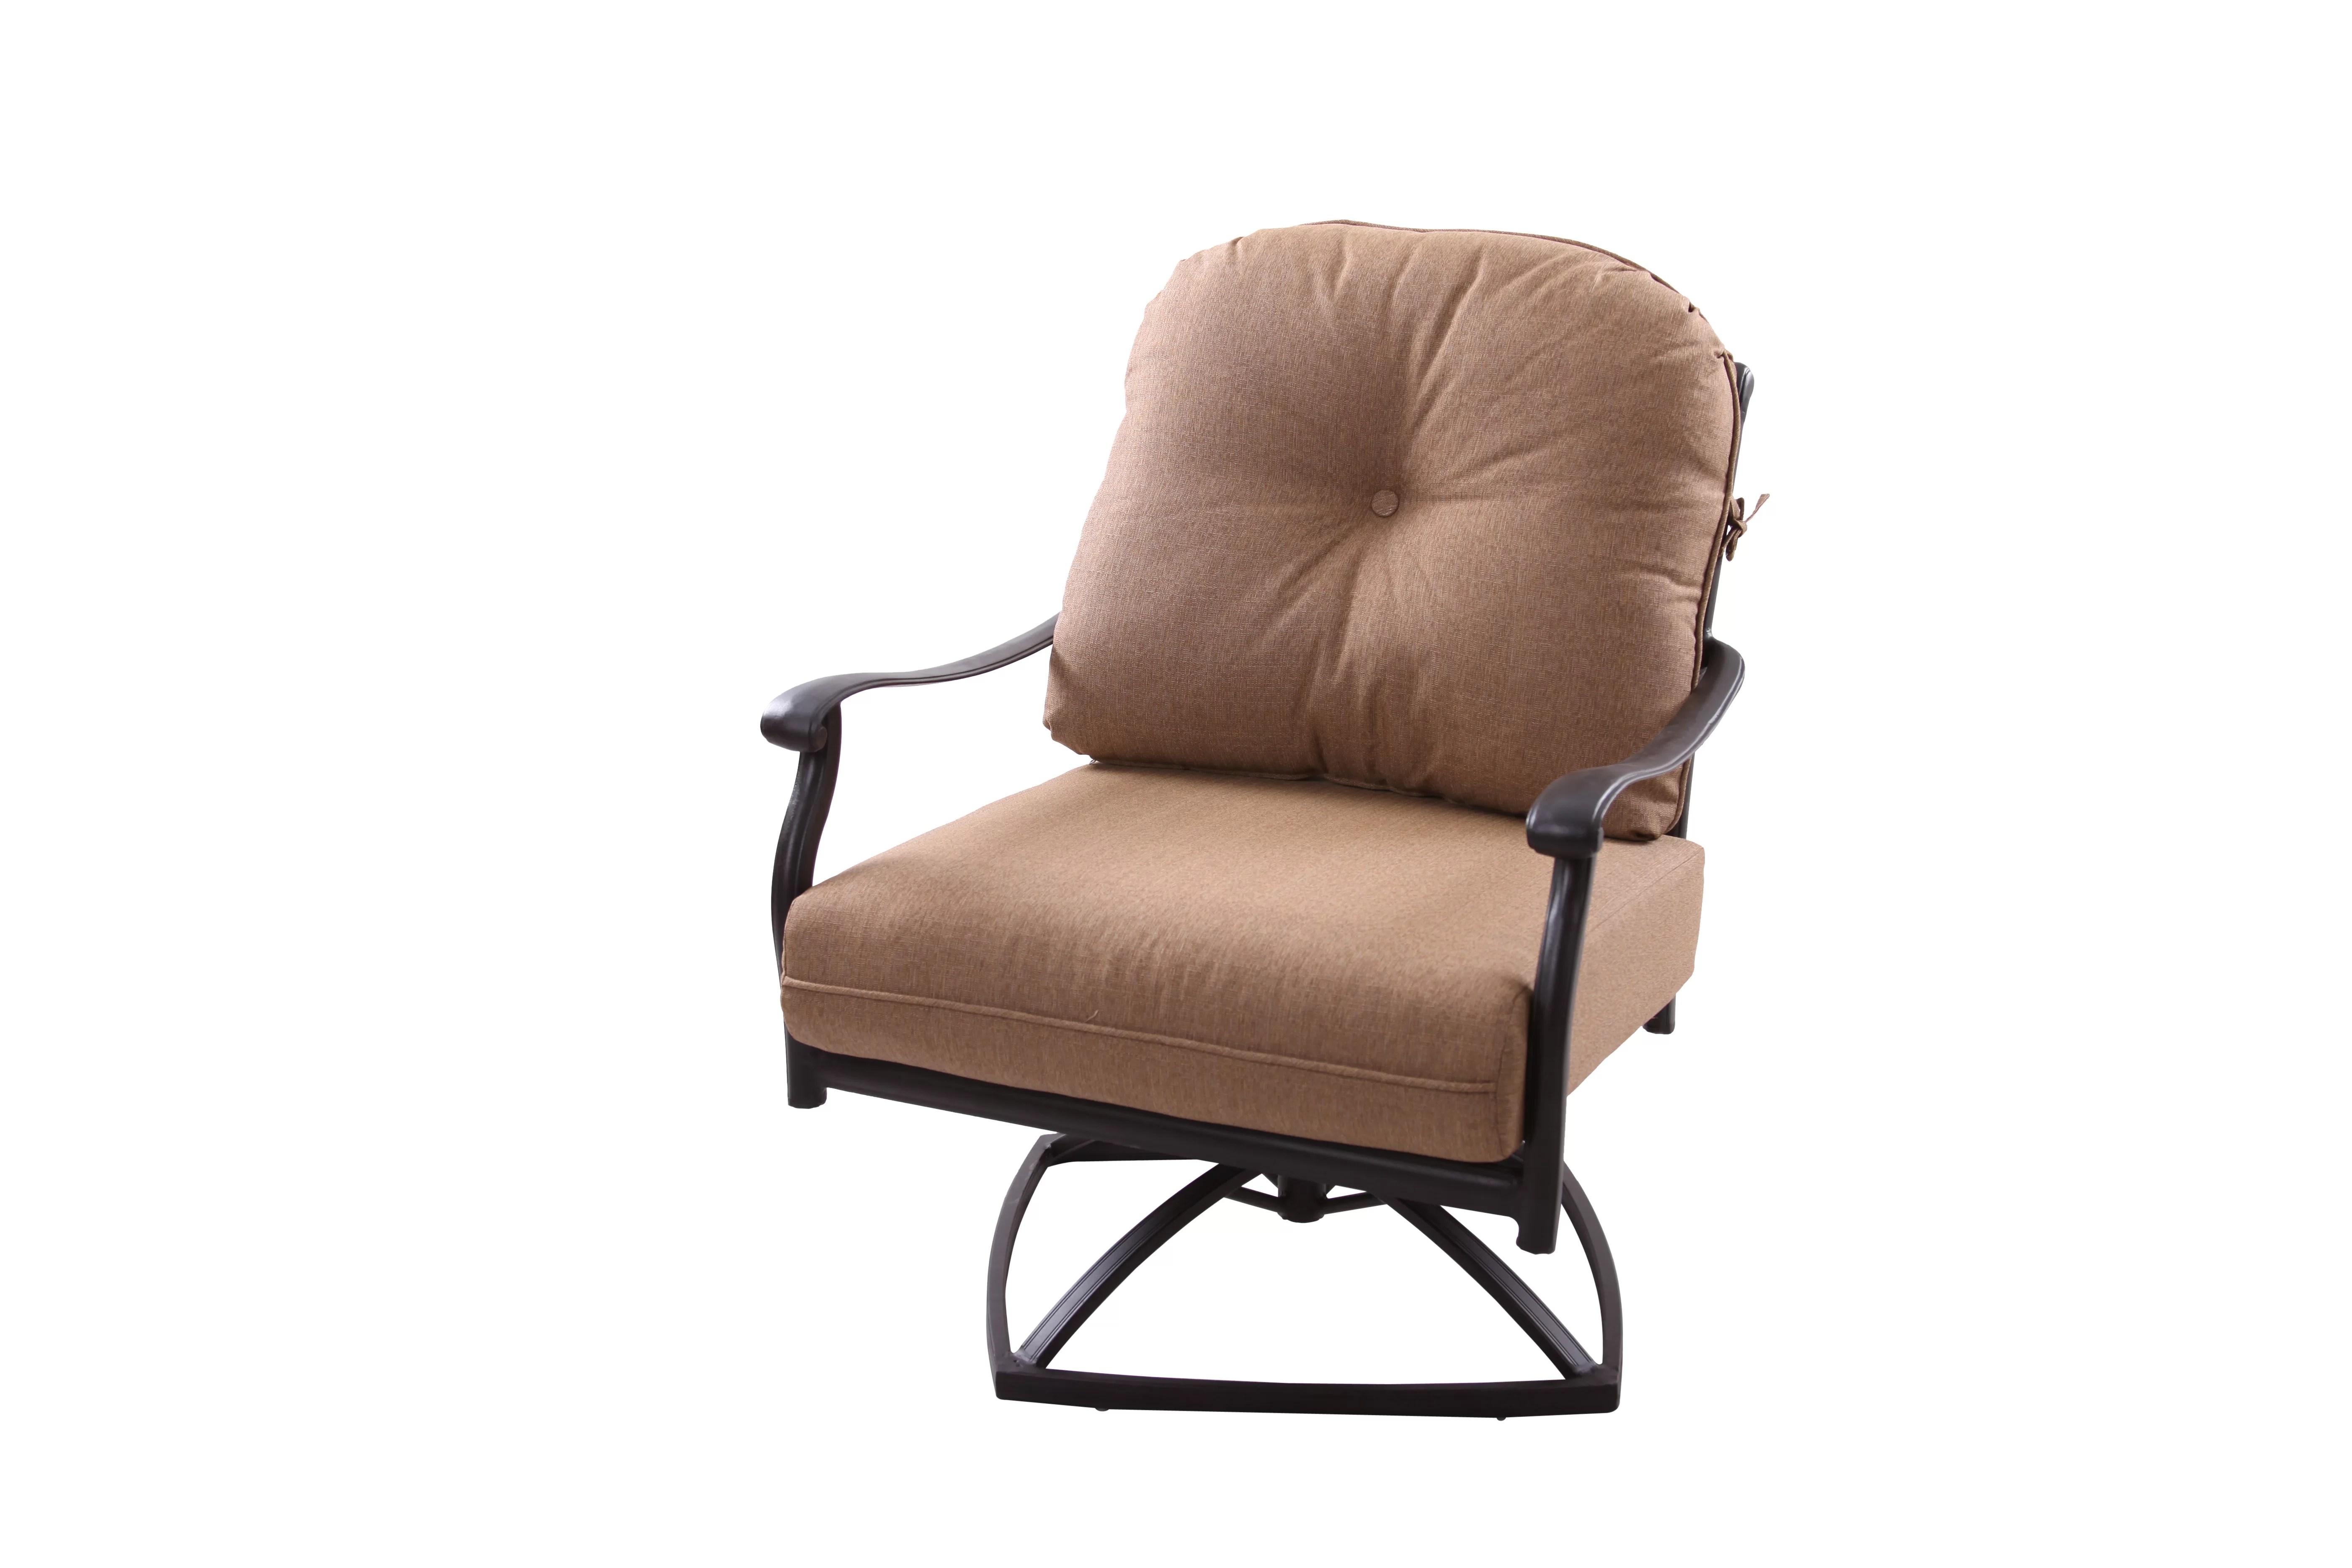 Alcott Hill Lenahan Rocker Swivel Recliner Patio Chair